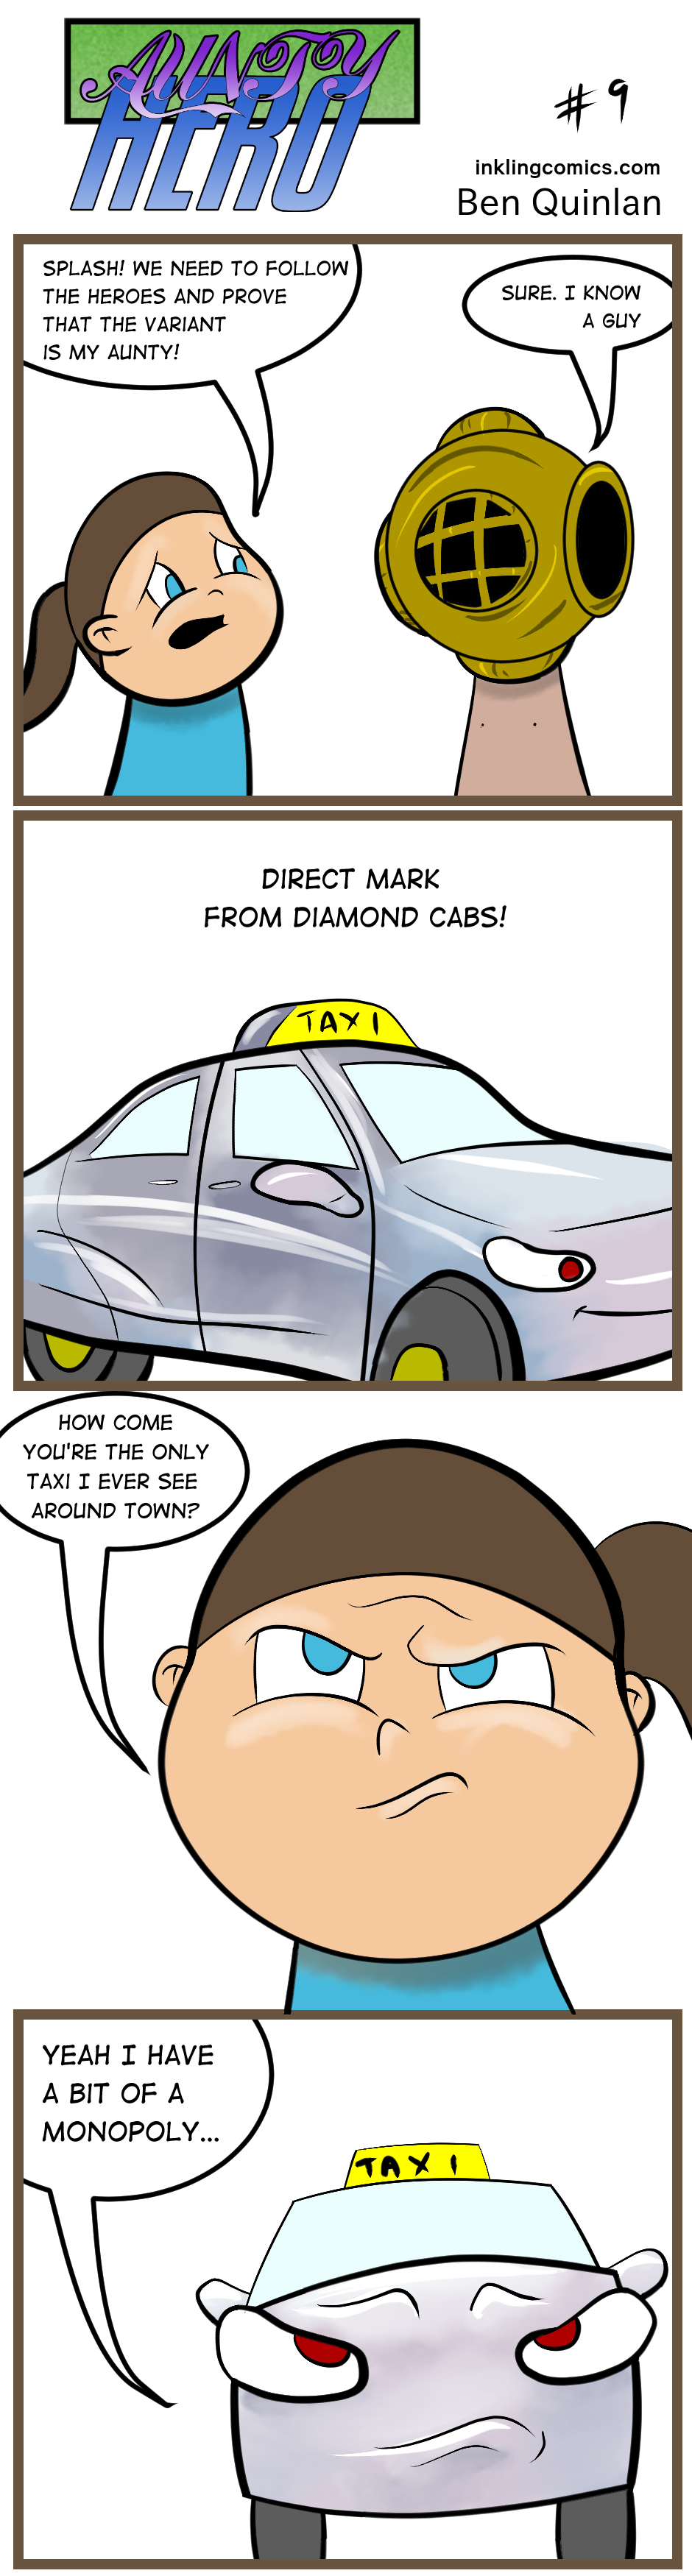 #diamond #diamonddistributors #comics #comicspuns #comicstrip #webcomic #puns #funny #gag #OC #cars #taxi #auntyhero #inklingcomics #mint #splashpage #directmarket